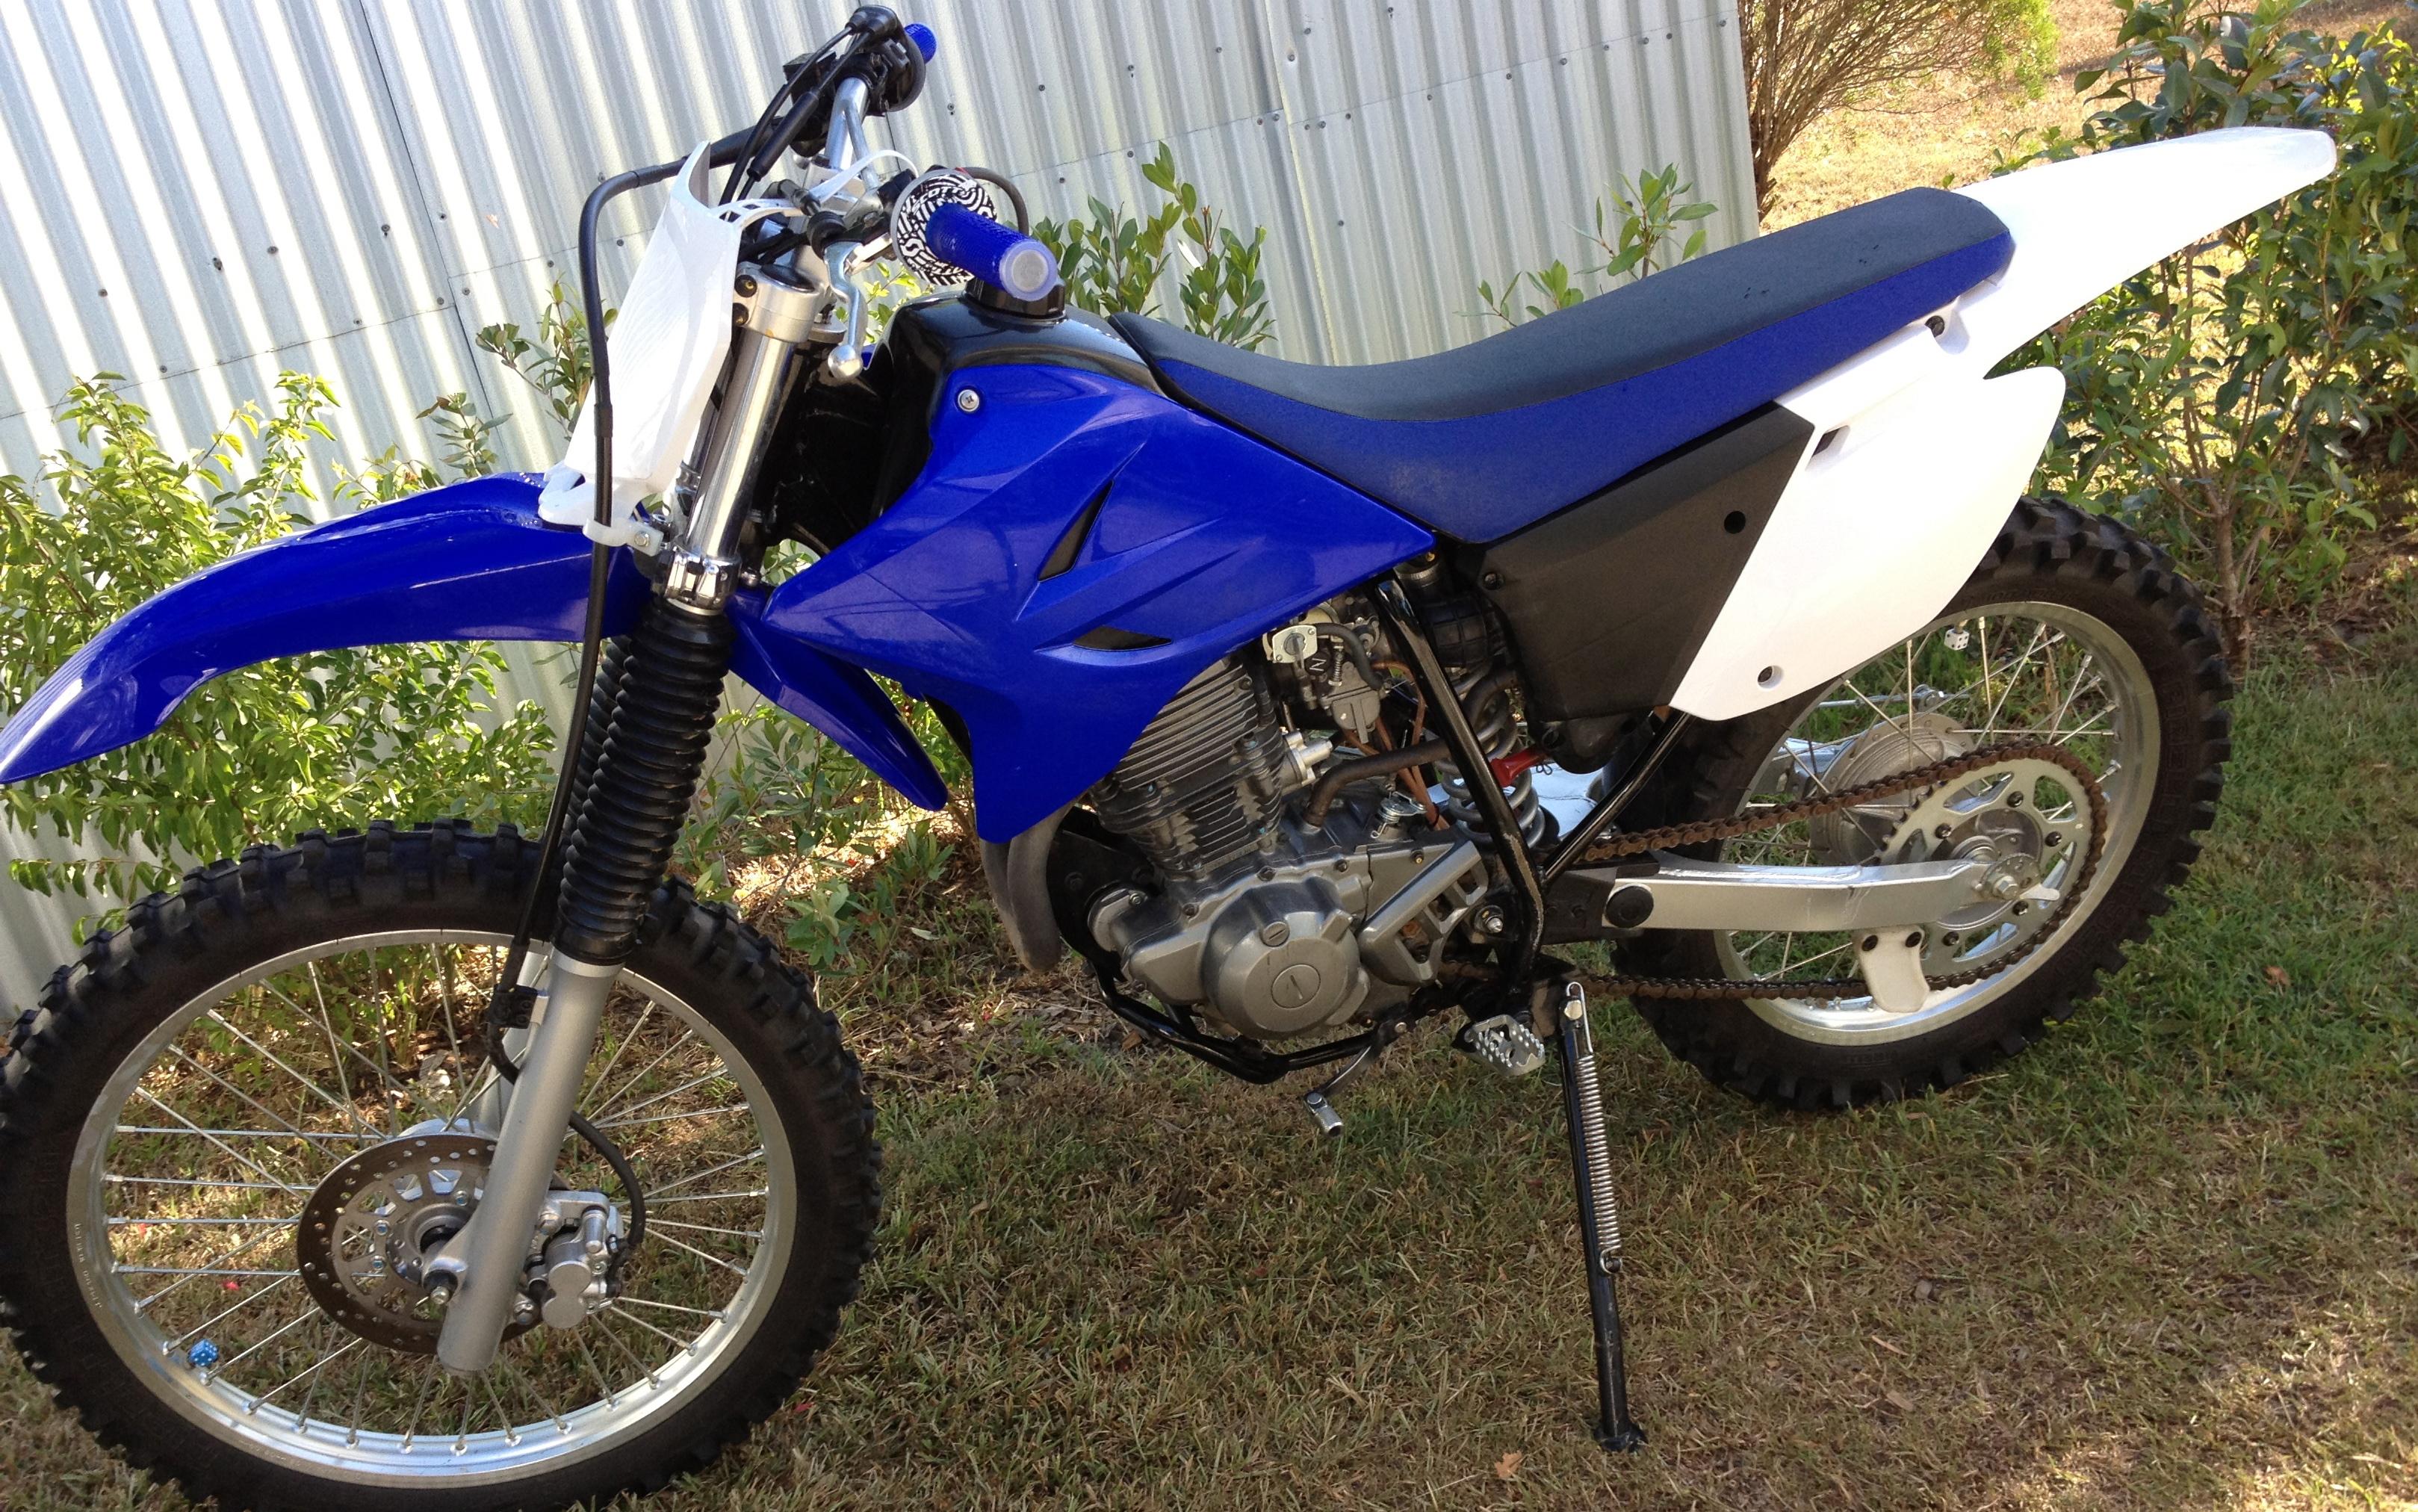 2014 yamaha r230 bike sales qld brisbane south 2921686 for Yamaha ttr 150 for sale